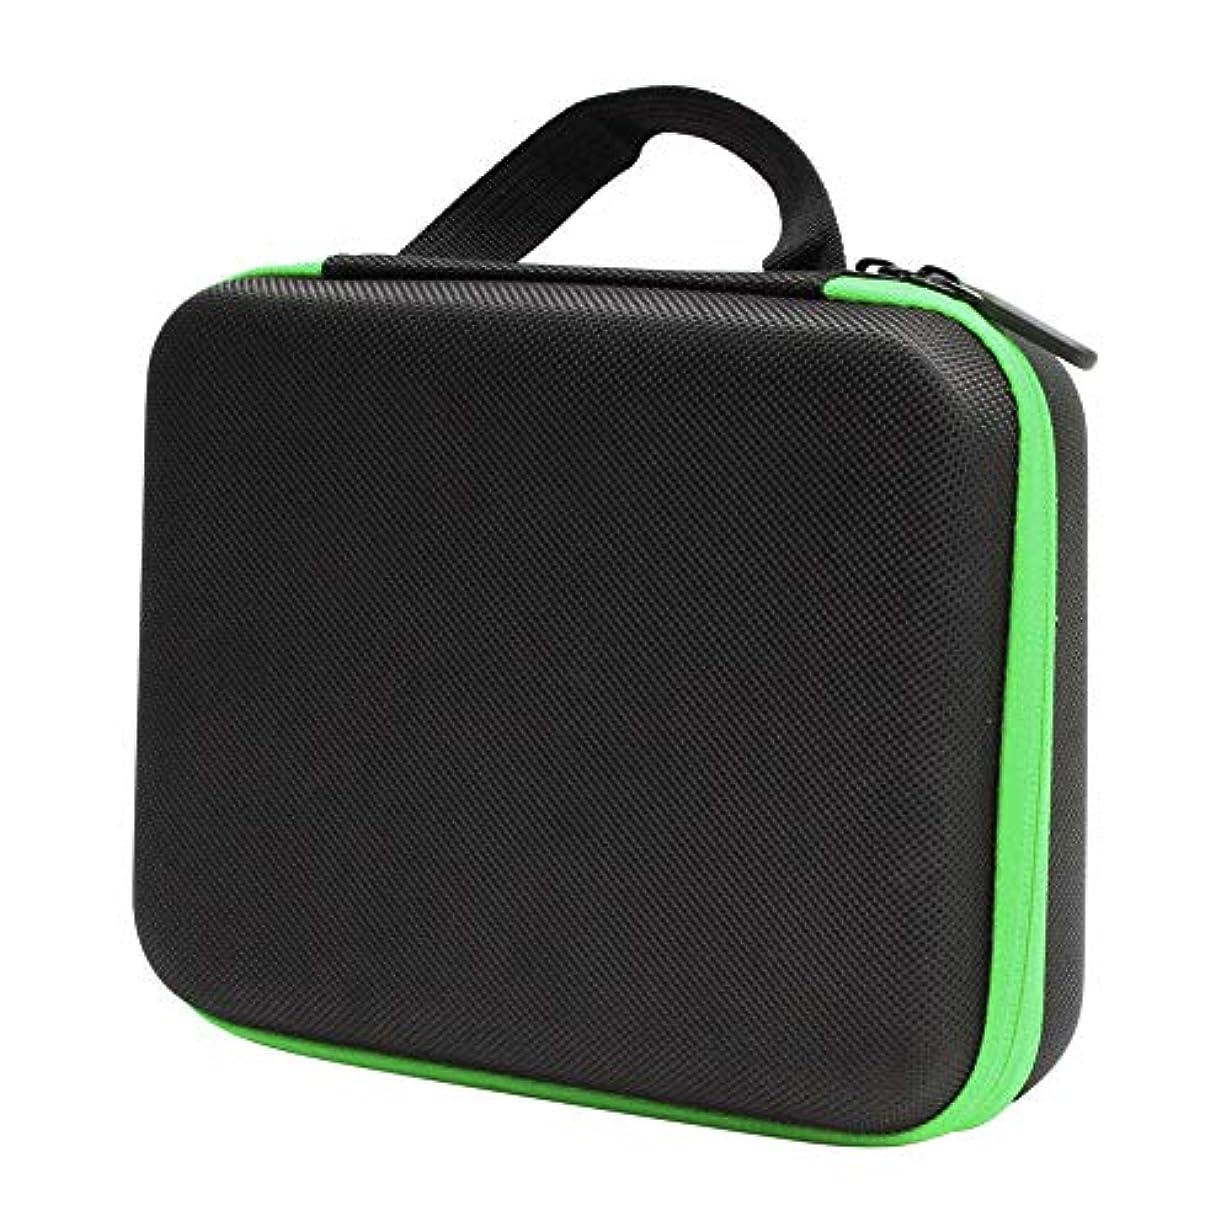 Hzjundasi 5ml/10ml/15ml 30本用 エッセンシャルオイル収納バッグ 携帯用 アロマオイルケース 精油収納 化粧ポーチ ハンドル付き 香水収納 大容量 耐震 EVA製